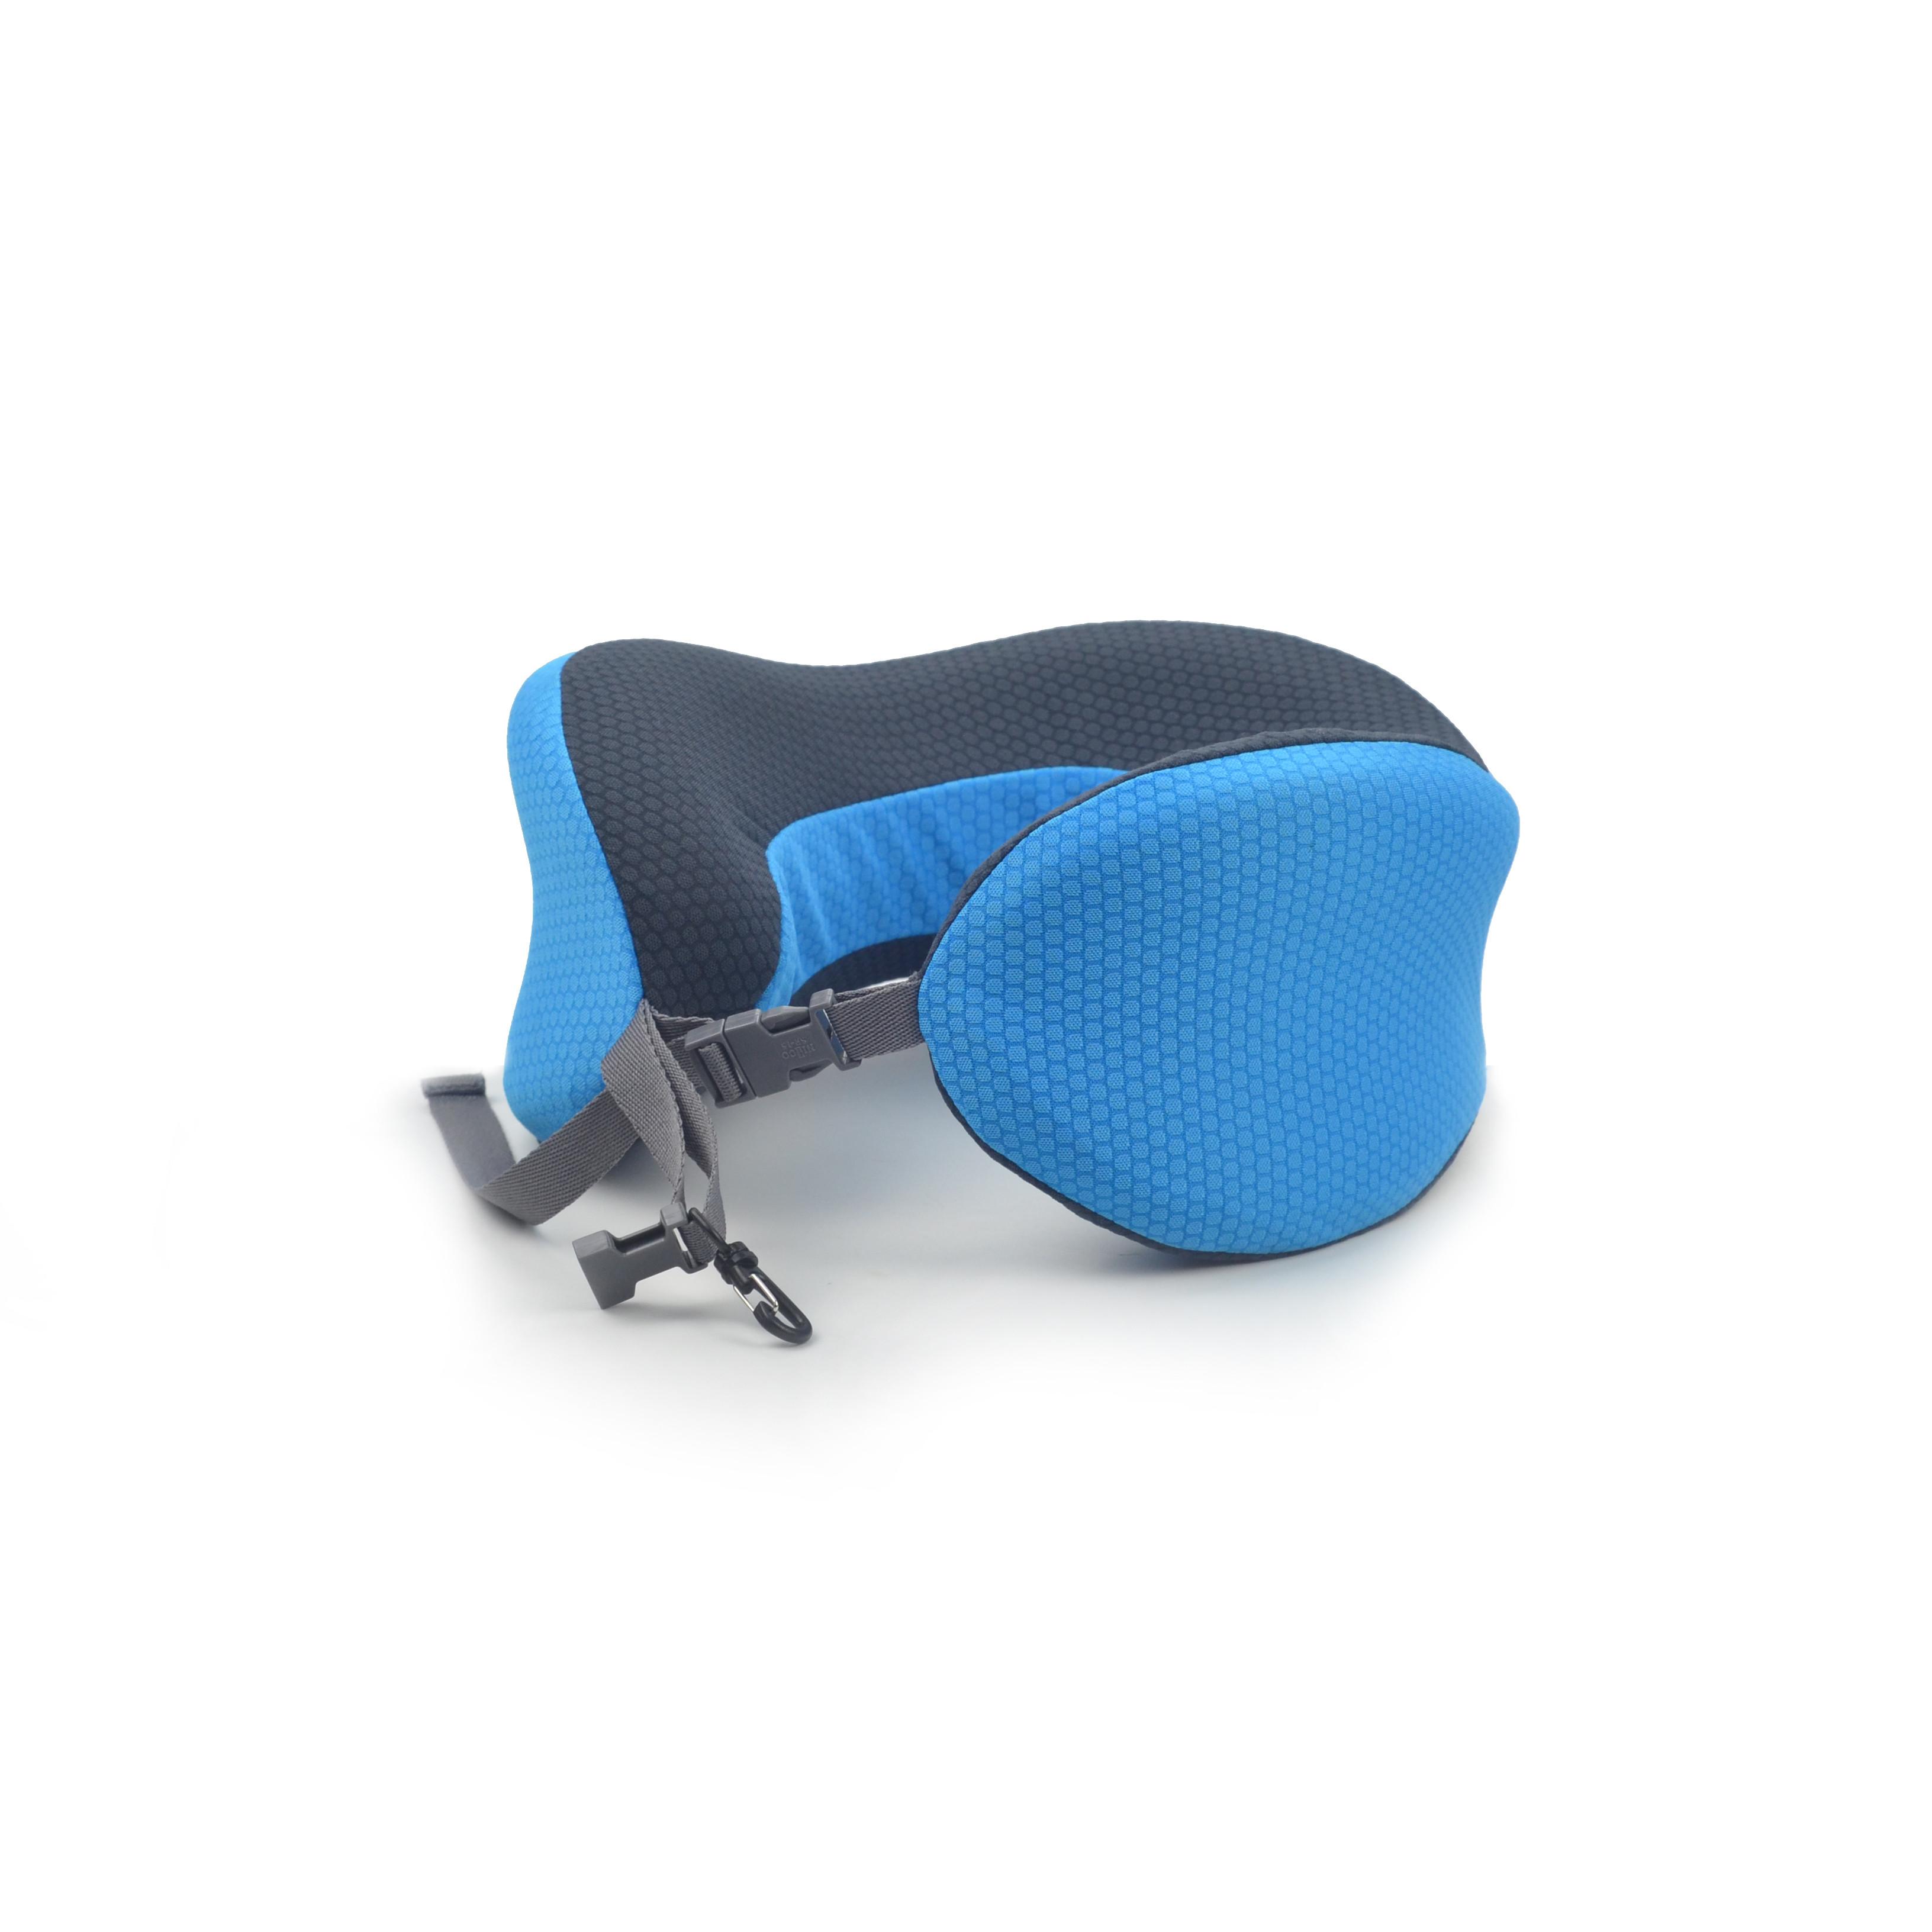 Blue portable custom travel pillow foldable travel pillow